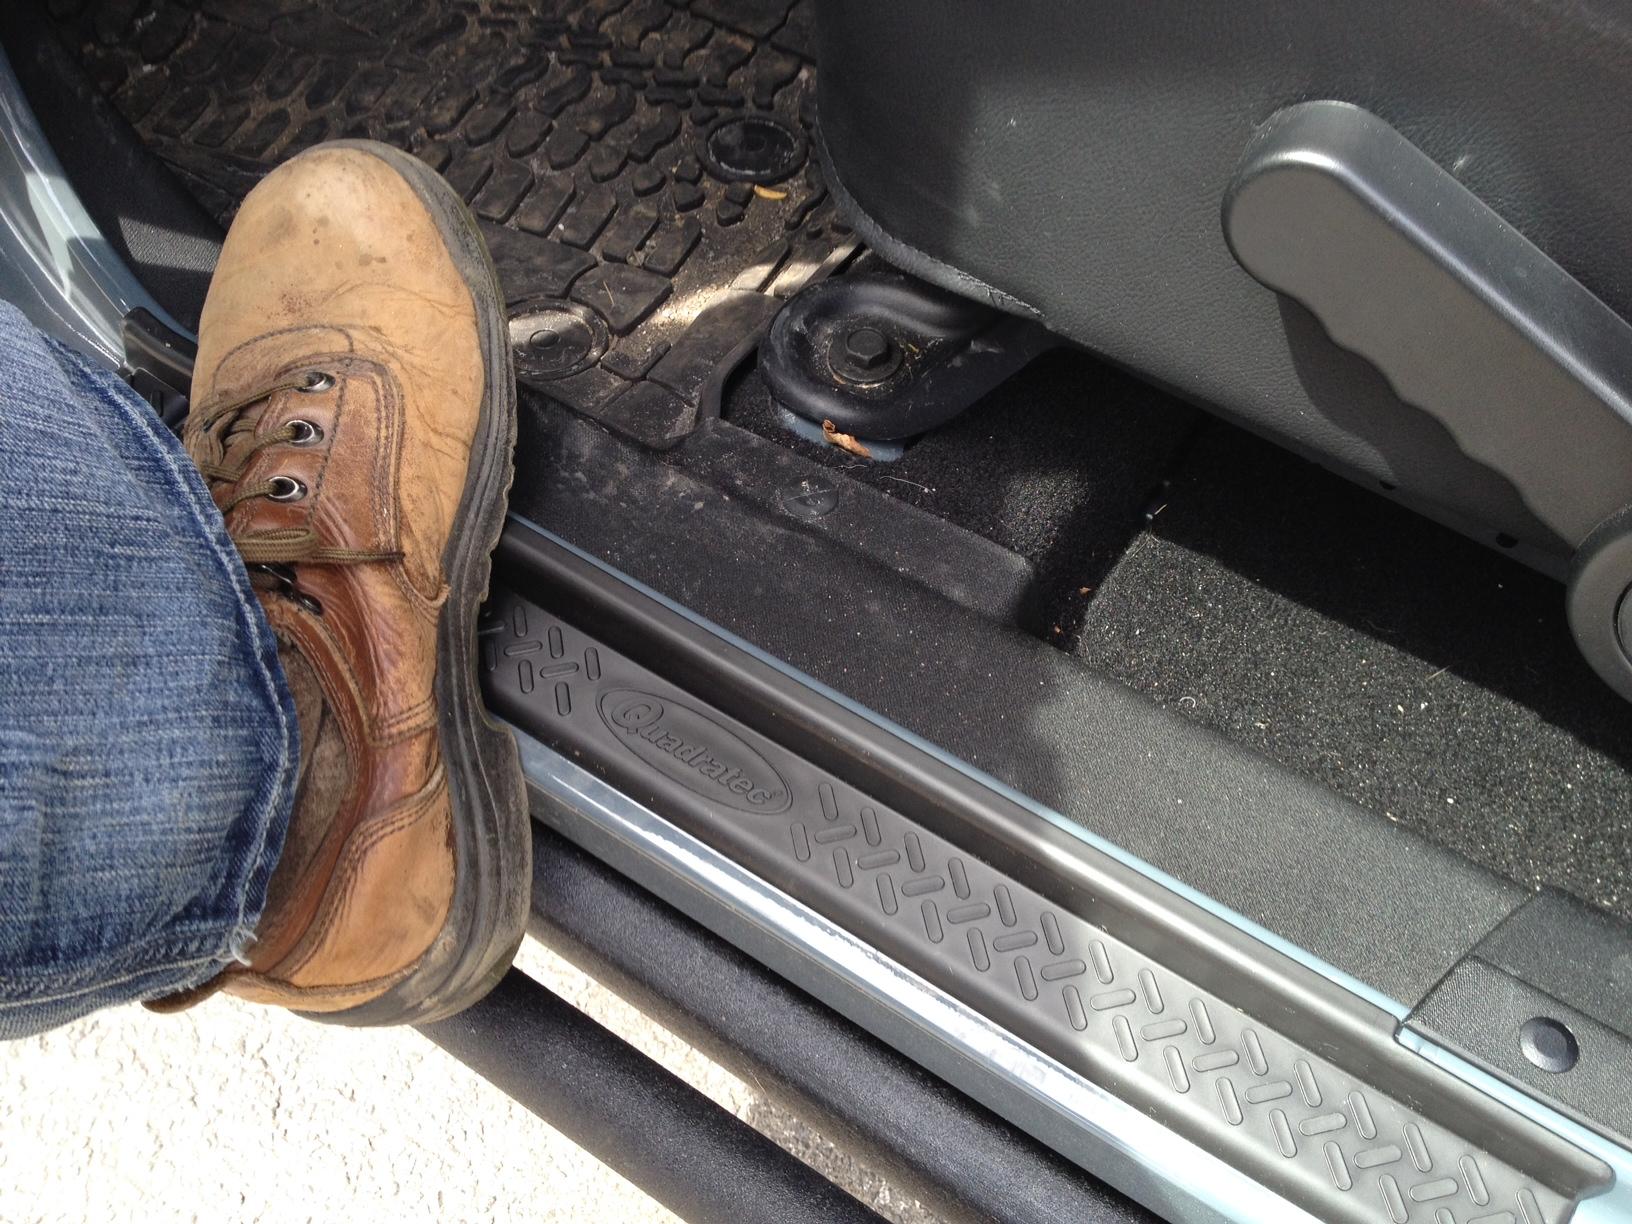 Jeep grand cherokee door entry guards